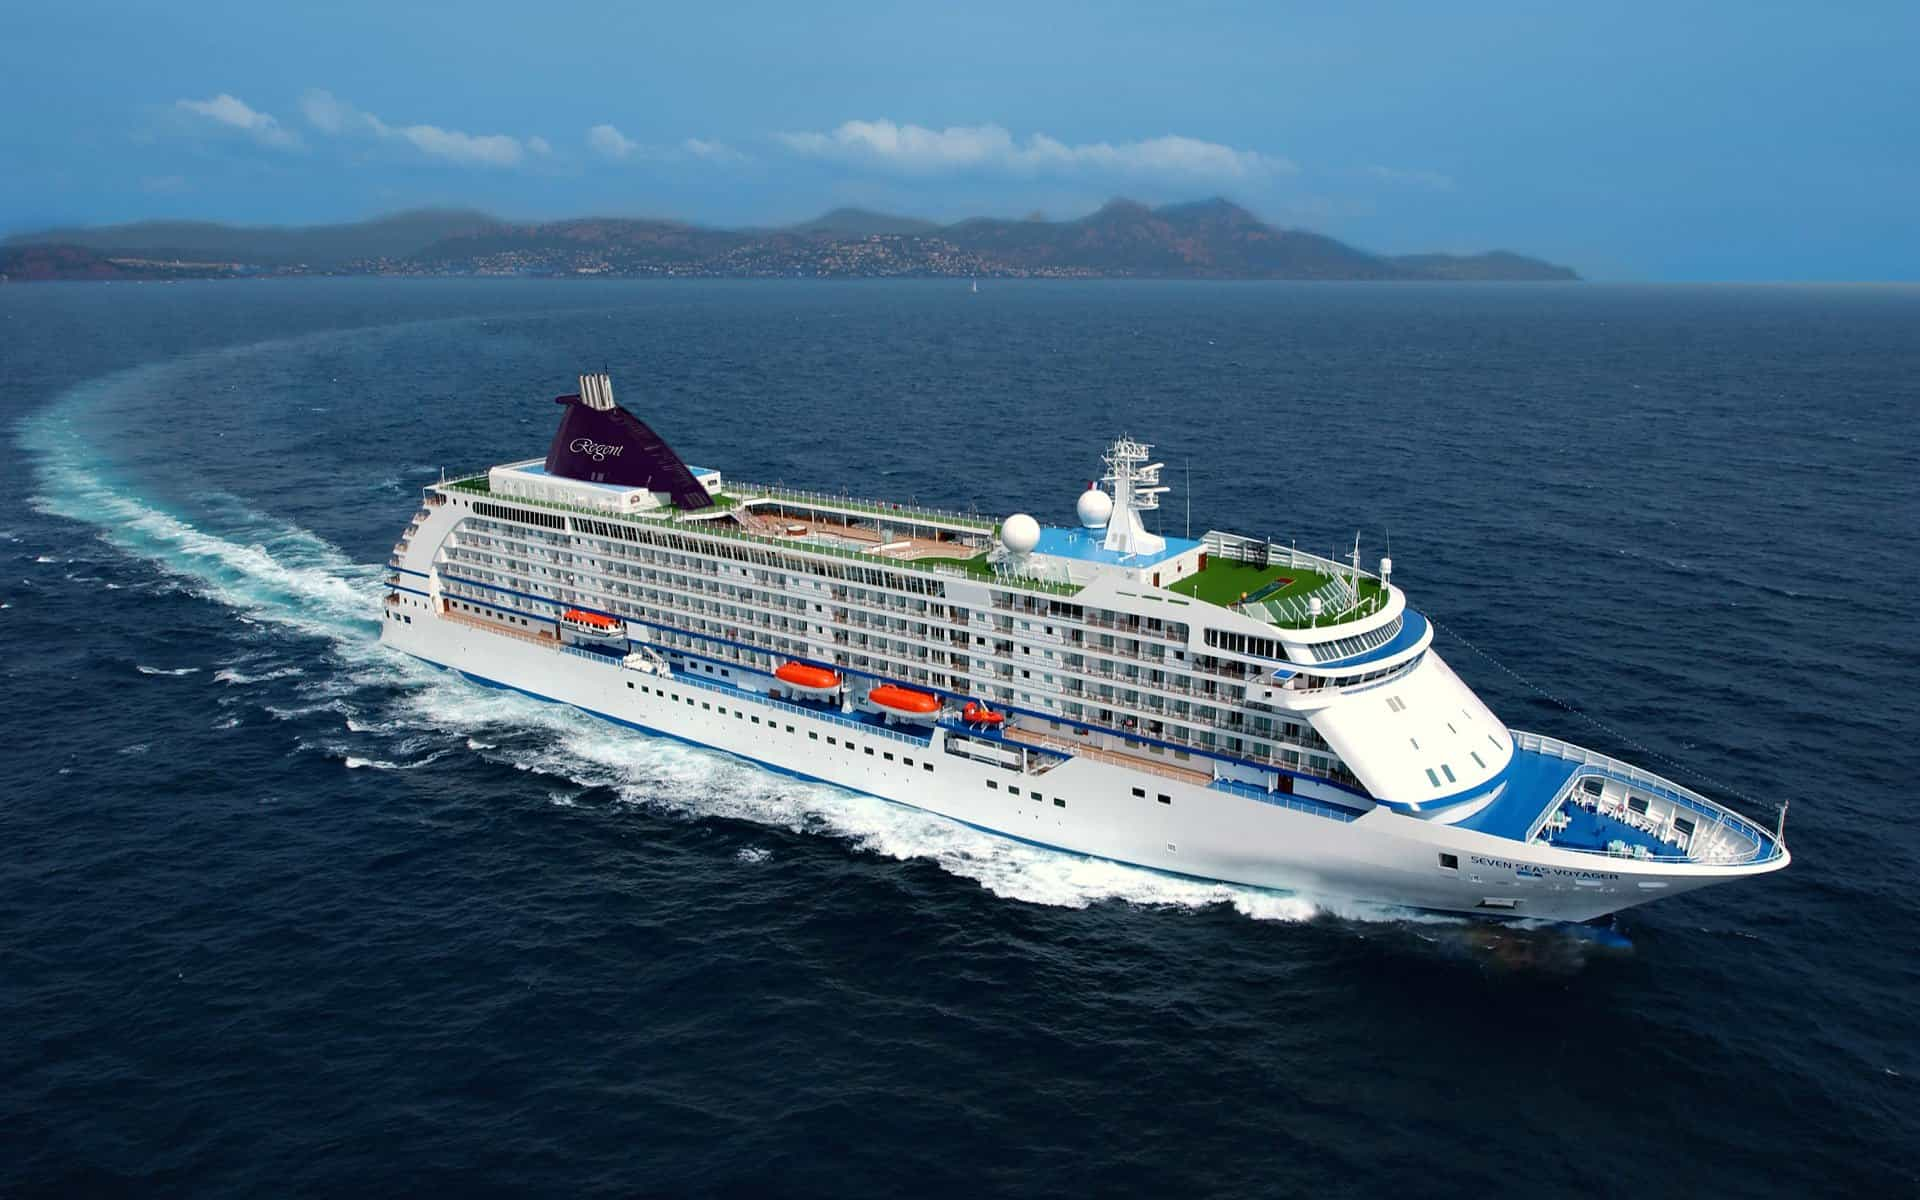 regent-seven-seas-cruise-ship